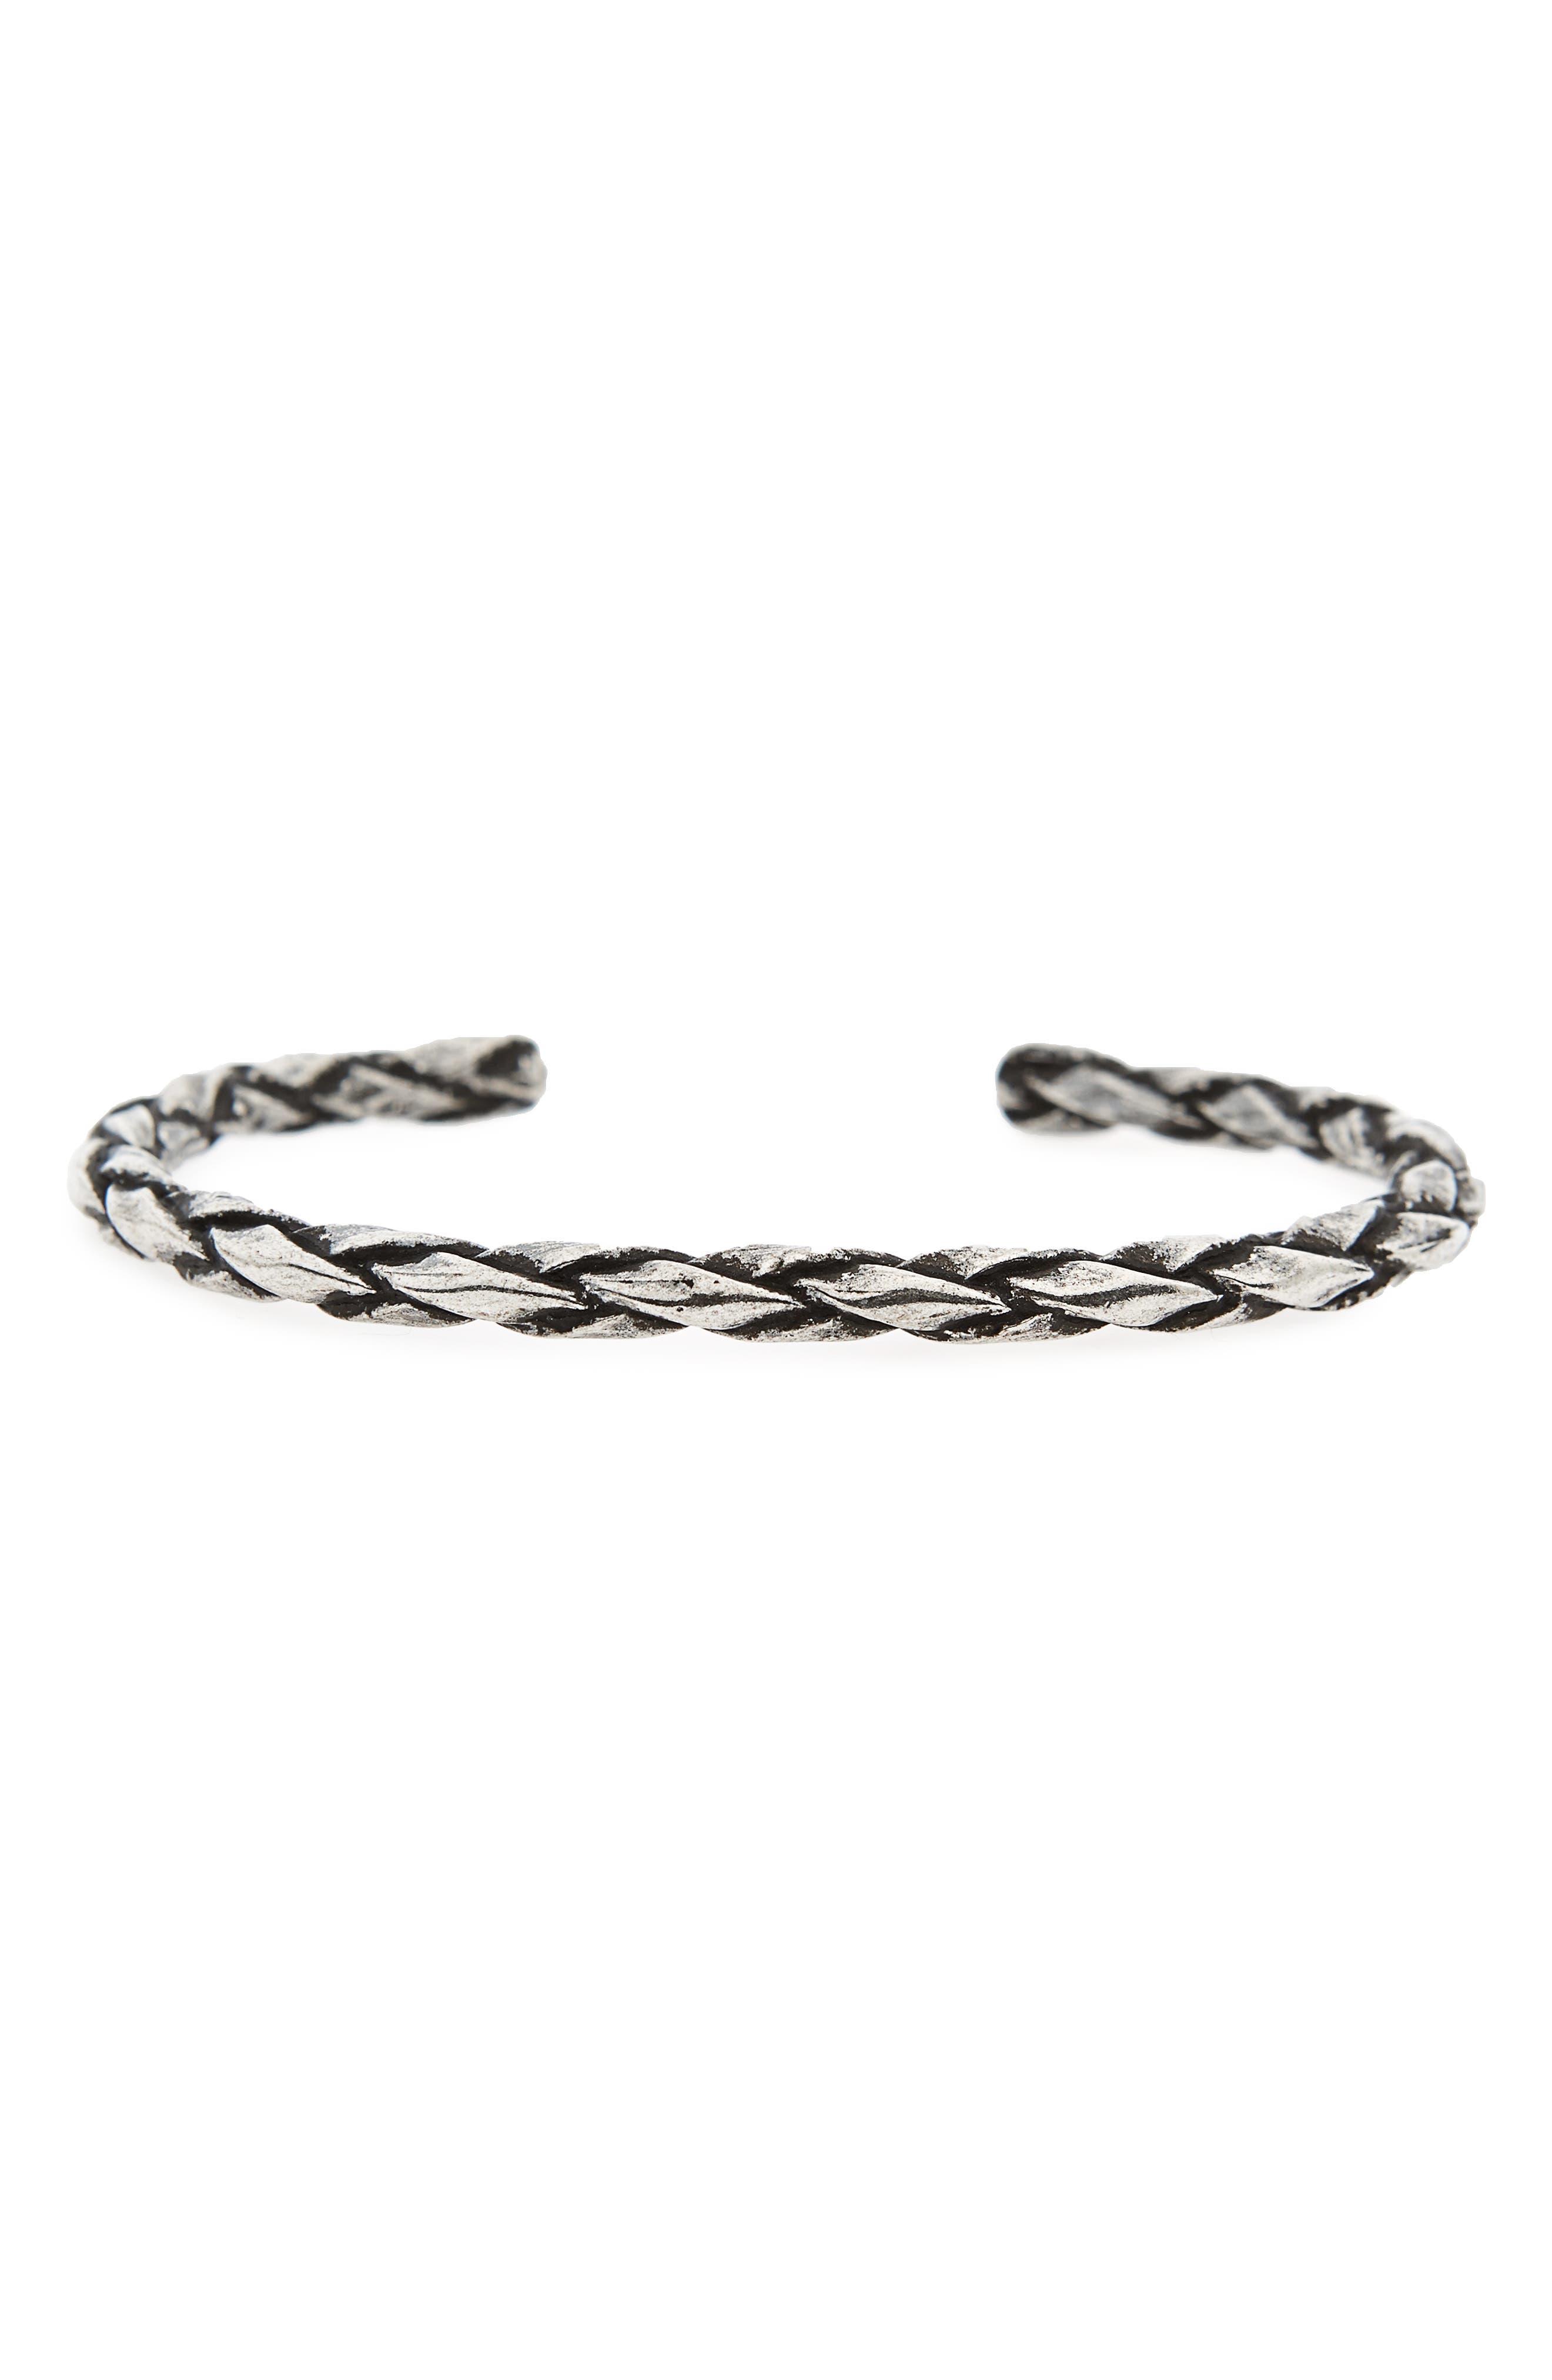 Silver Cuff Bracelet,                             Main thumbnail 1, color,                             Silver